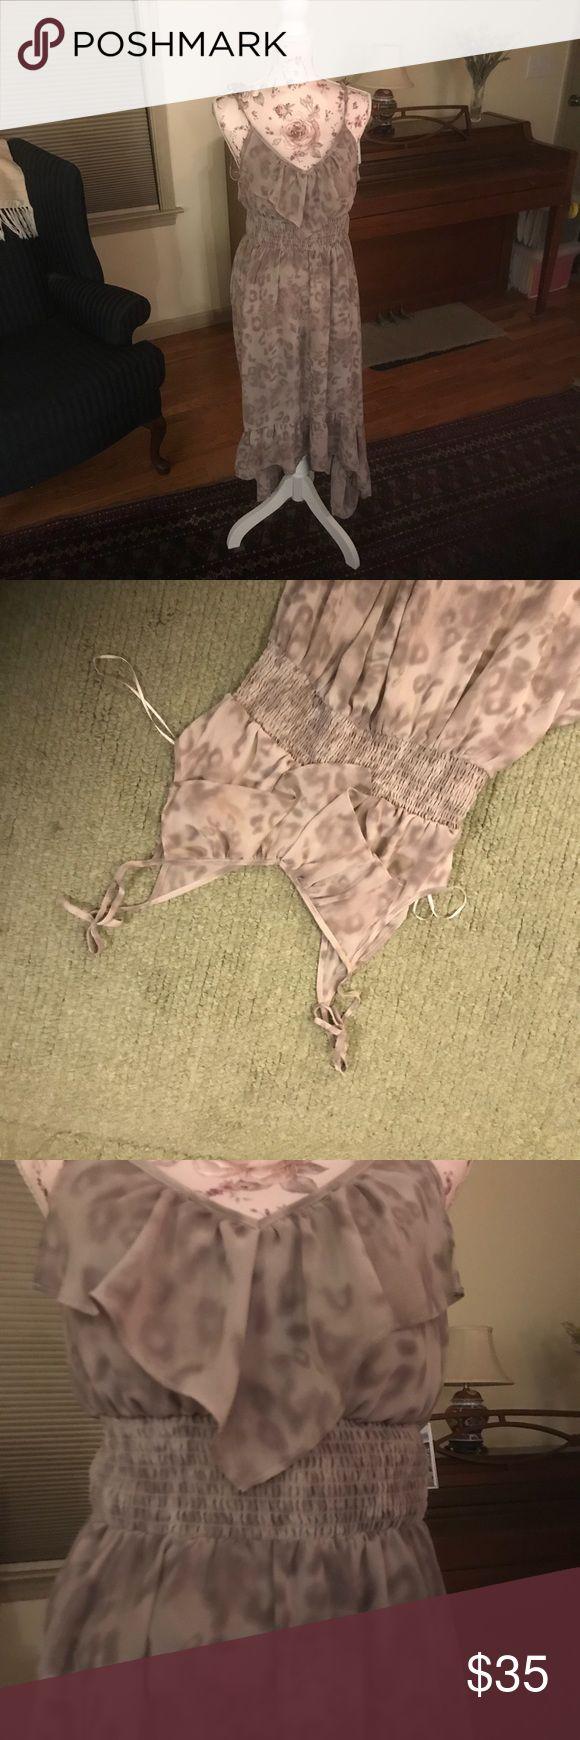 Flowey Highlow animal print Guess dress🔥🔥🔥 Flowey chiffon Highlow dress with ruffled trim and detailing. Good summer dress! Make me an offer! Guess Dresses High Low